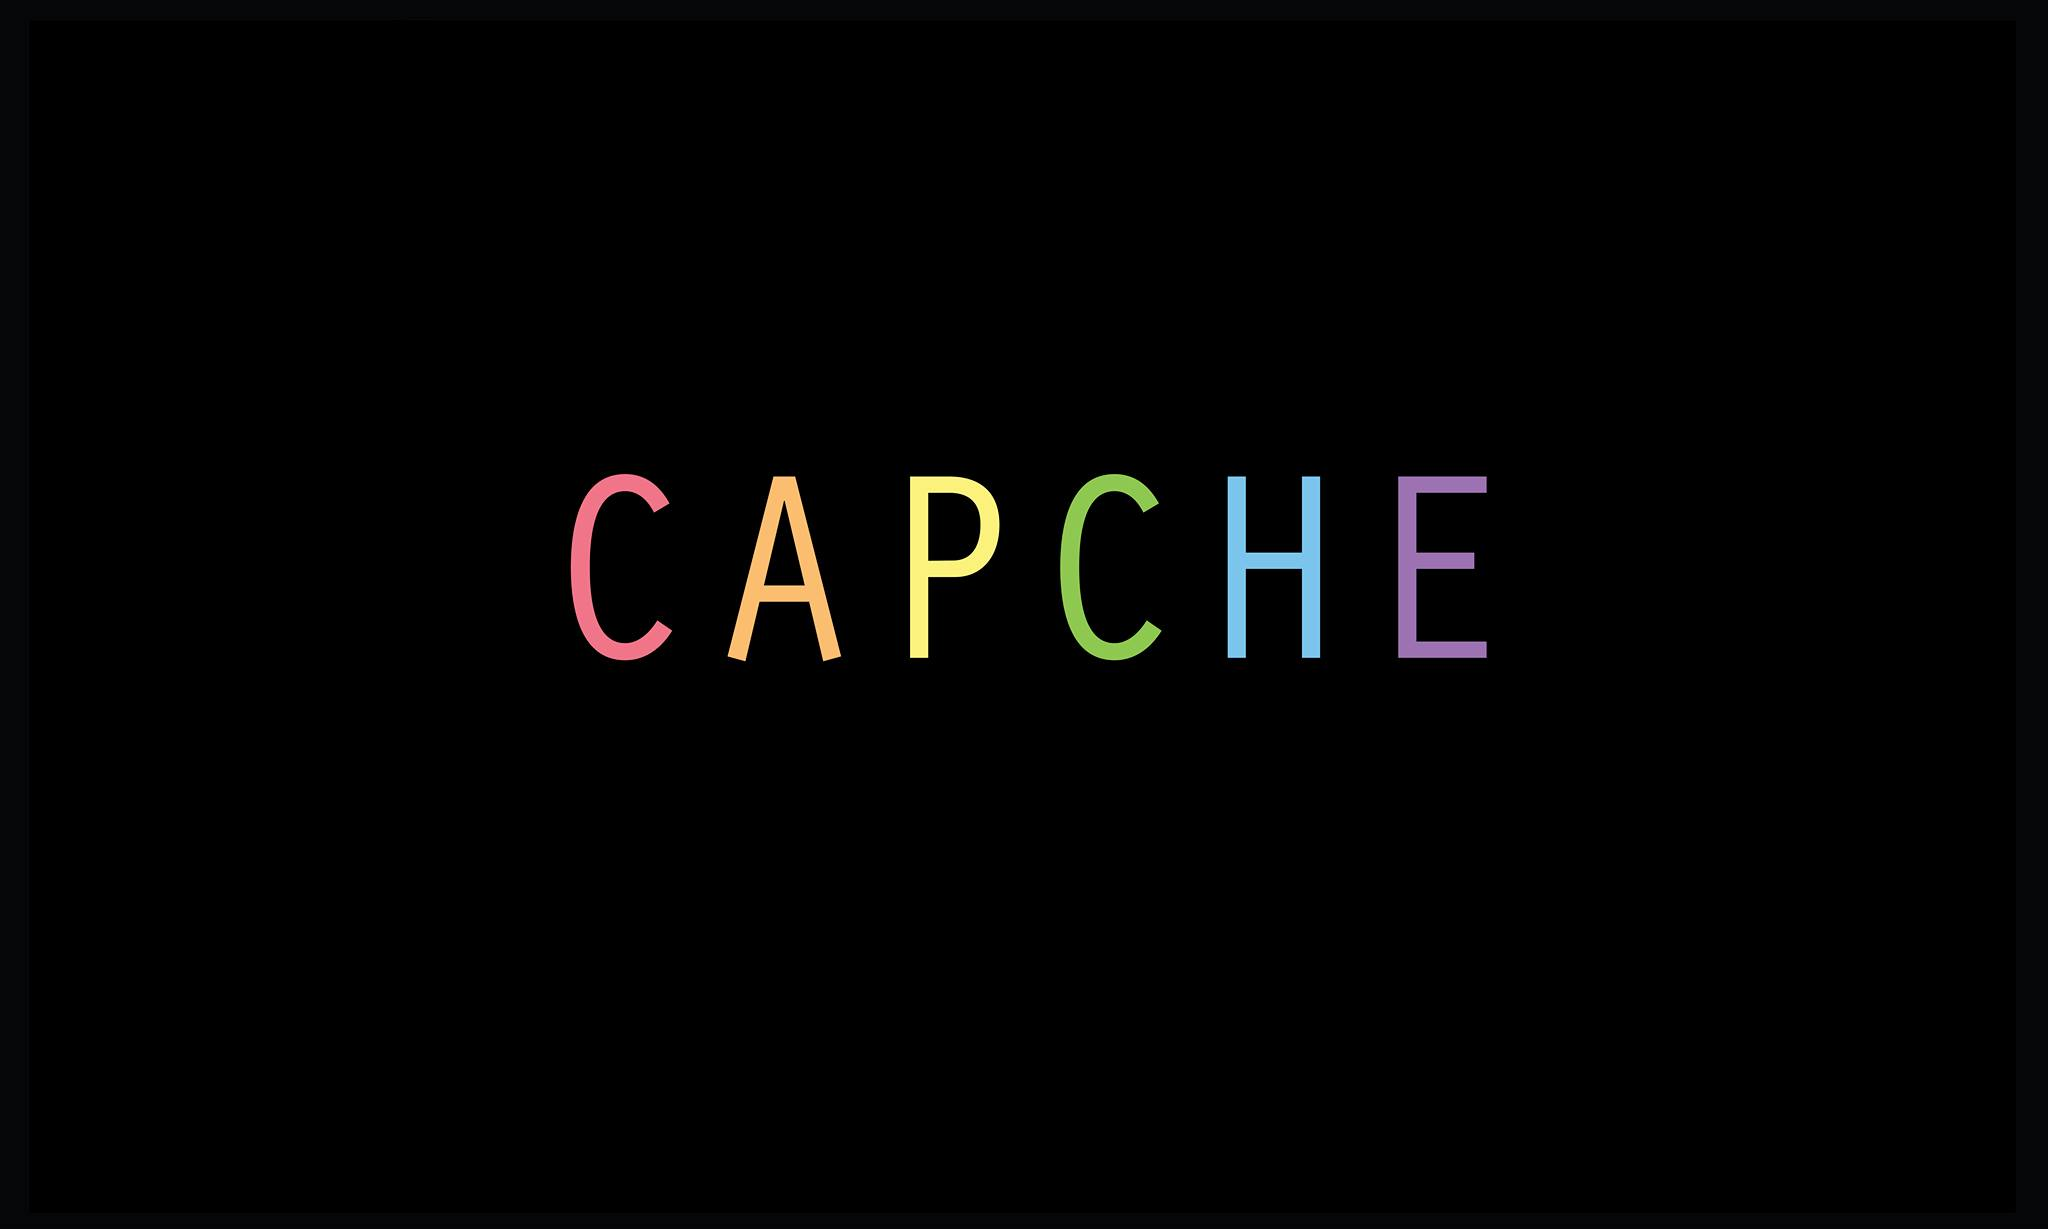 Capche